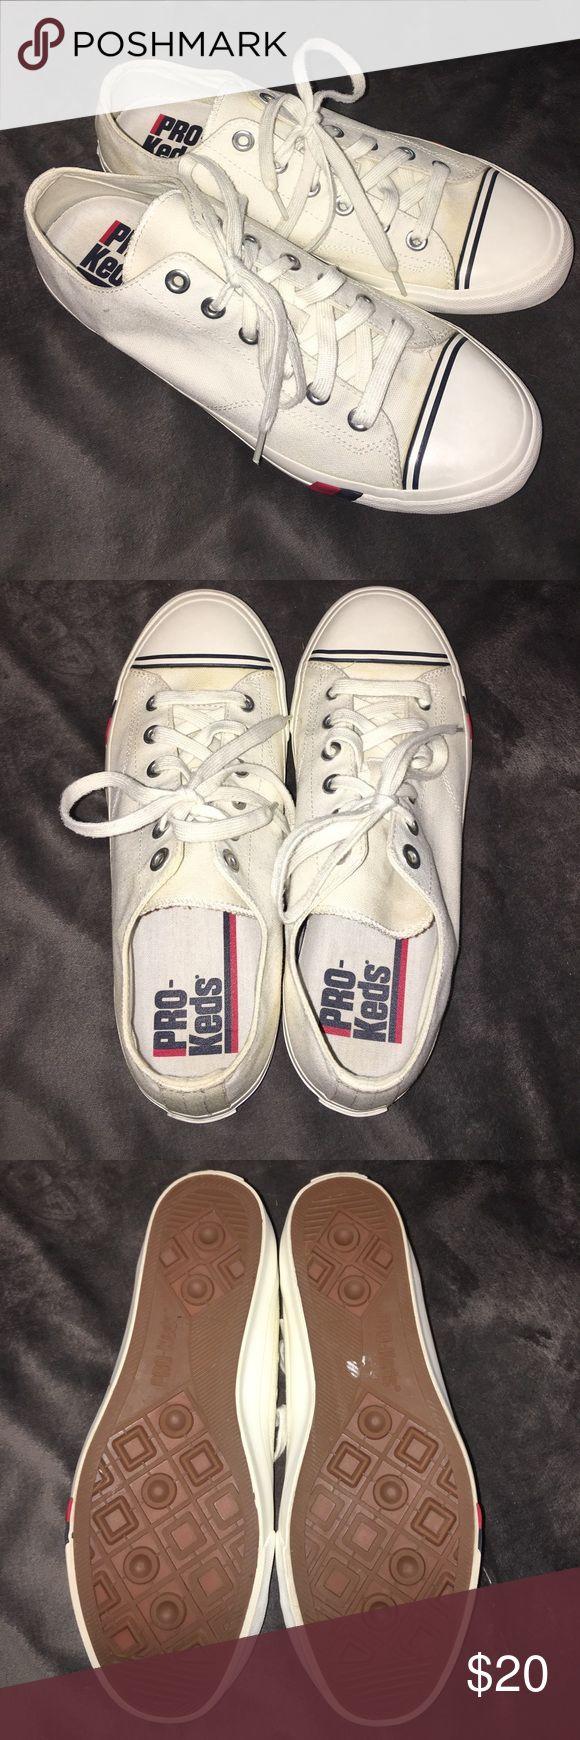 Pro Keds. Men's size 10.5. Brand New Pro Keds. Men's size 10.5 euro 44. White canvas. Brand new. No box. Pro Keds Shoes Moccasins